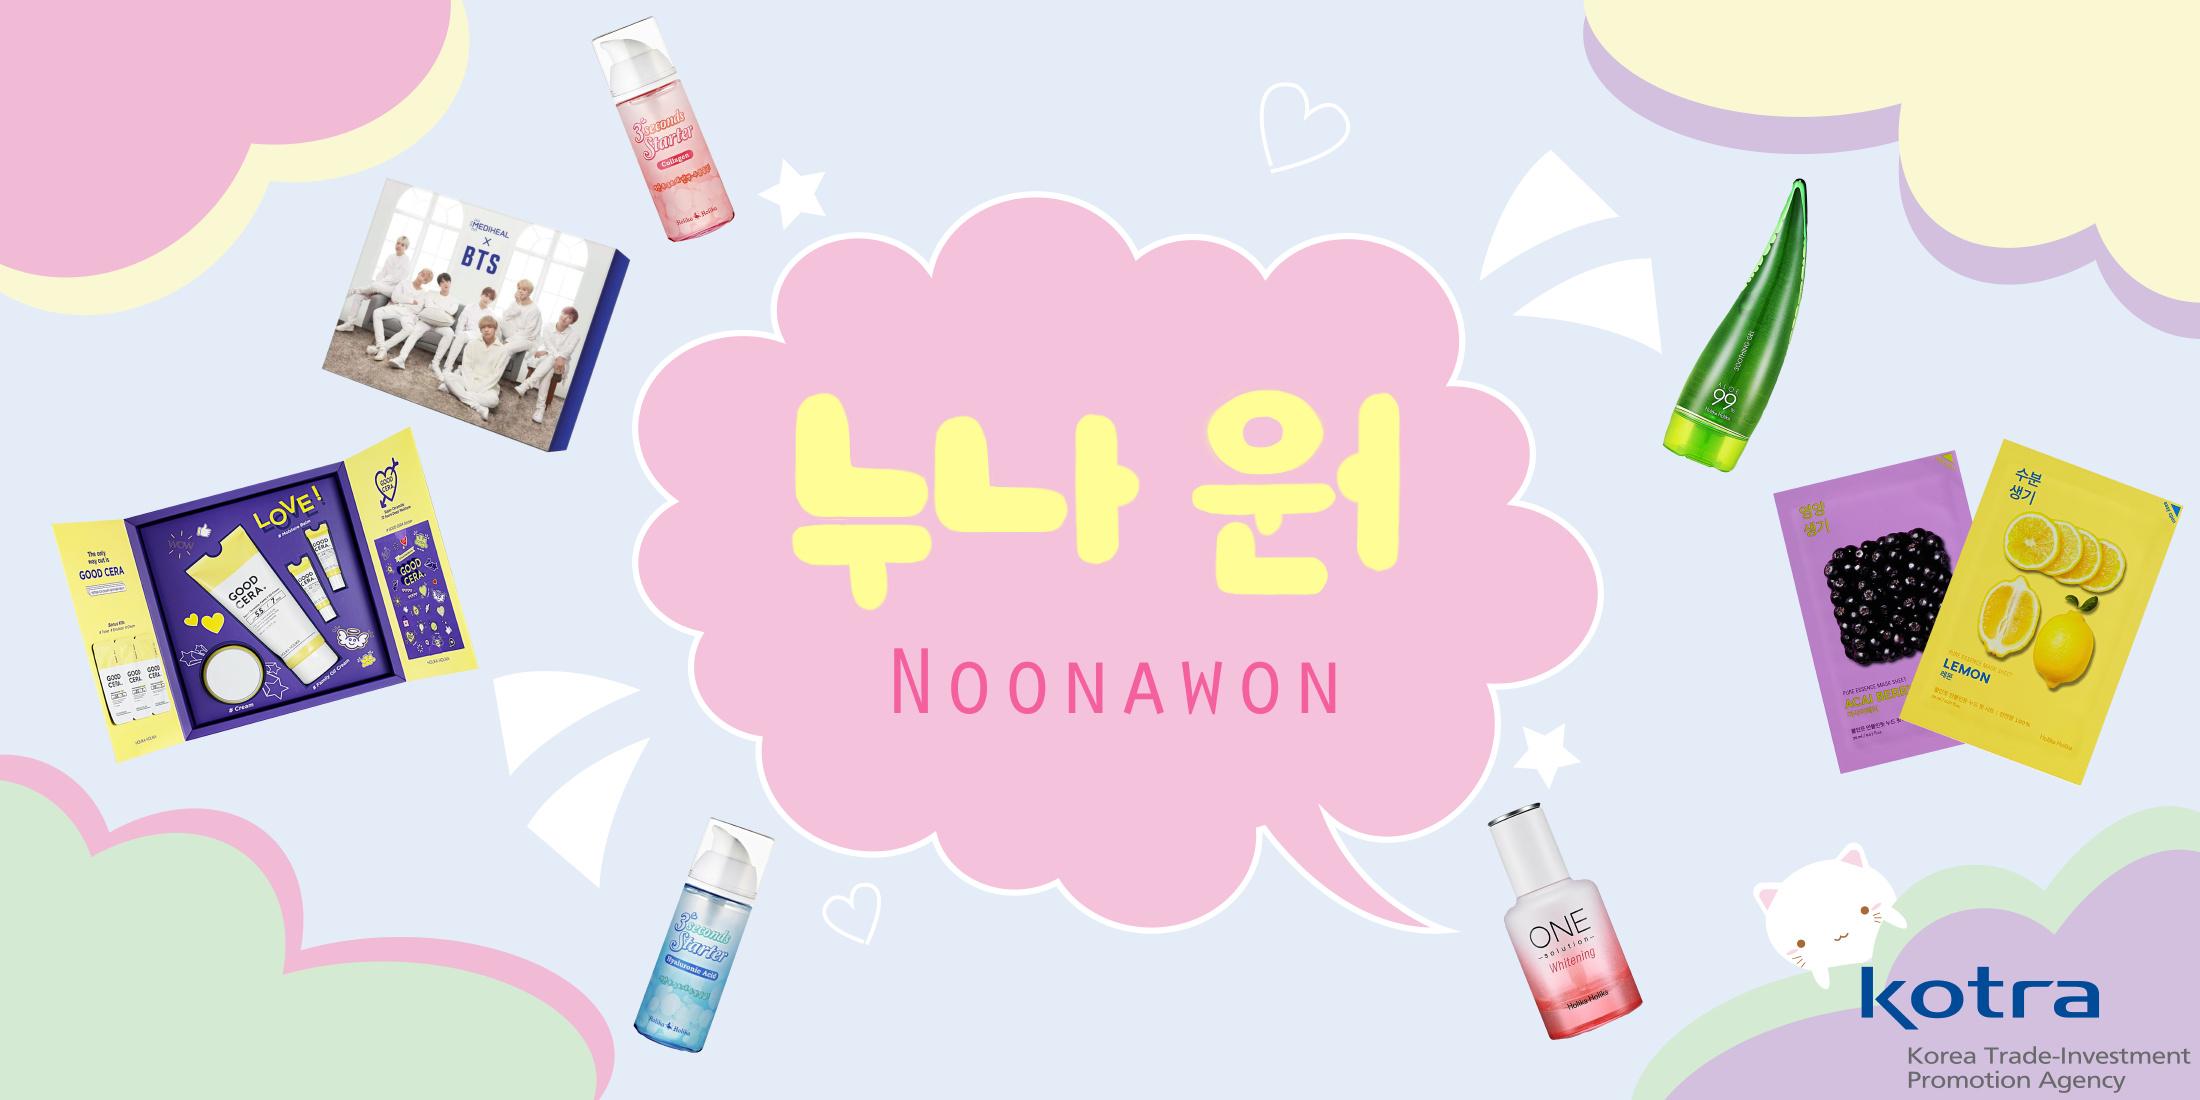 Noonawon